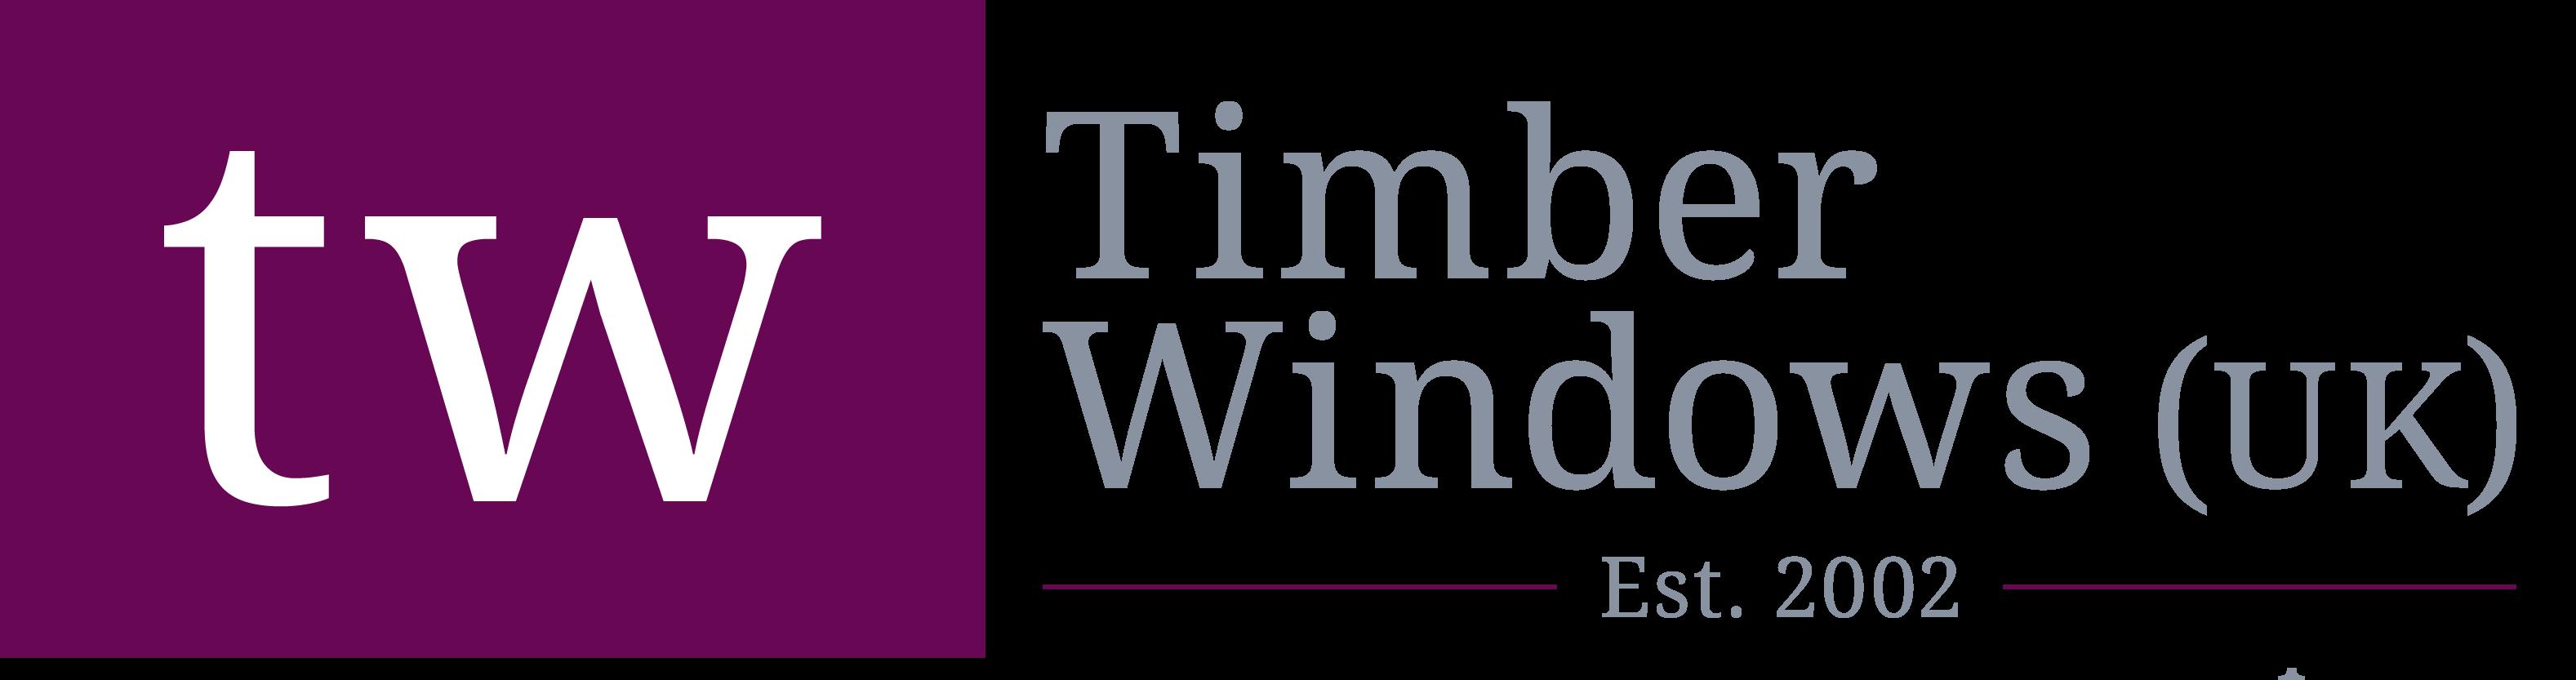 Timber Windows UK Ltd